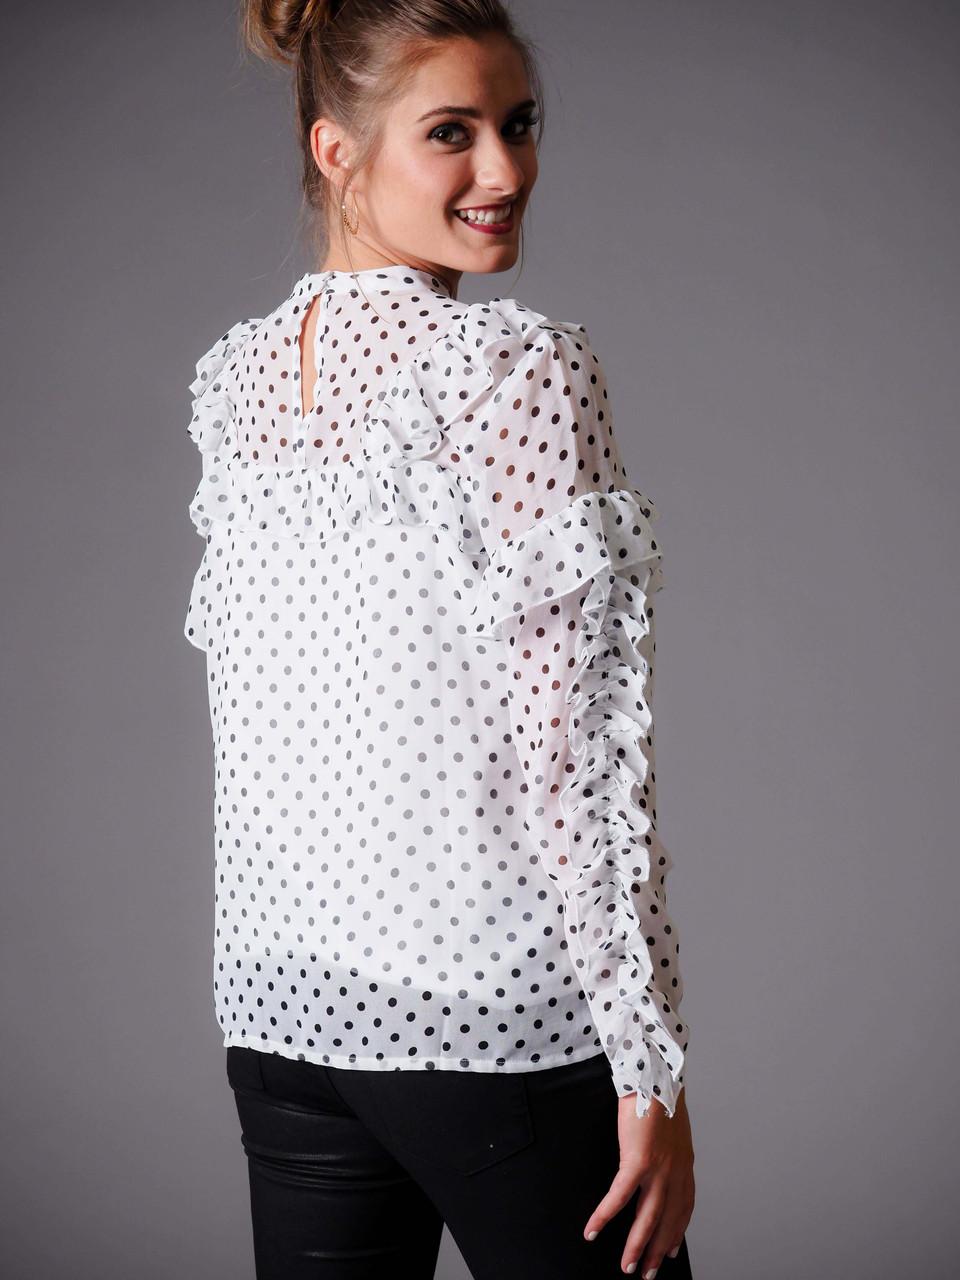 black and white polka dot ruffle blouse